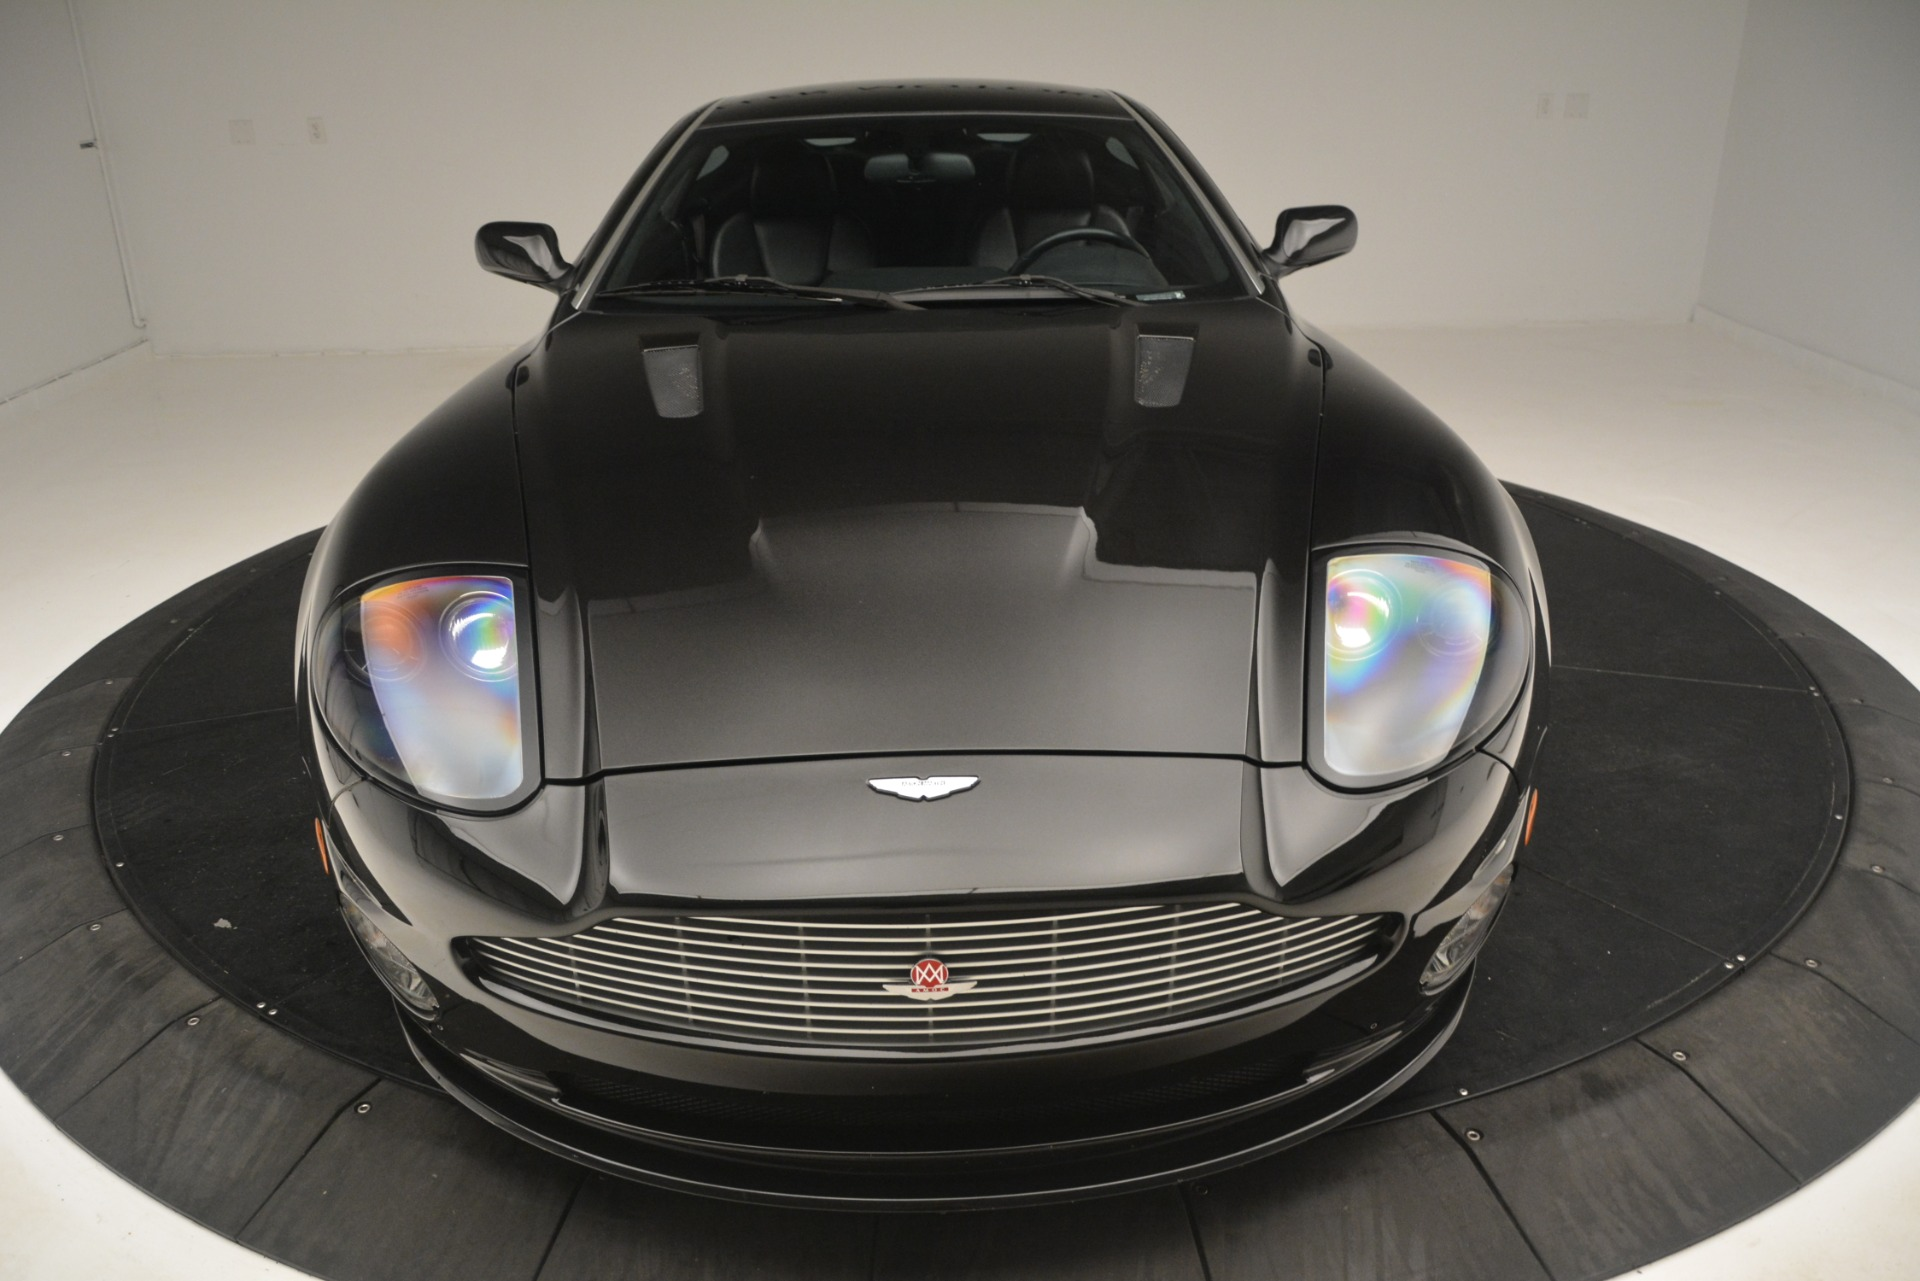 Used 2004 Aston Martin V12 Vanquish  For Sale In Greenwich, CT. Alfa Romeo of Greenwich, 7557C 3160_p10